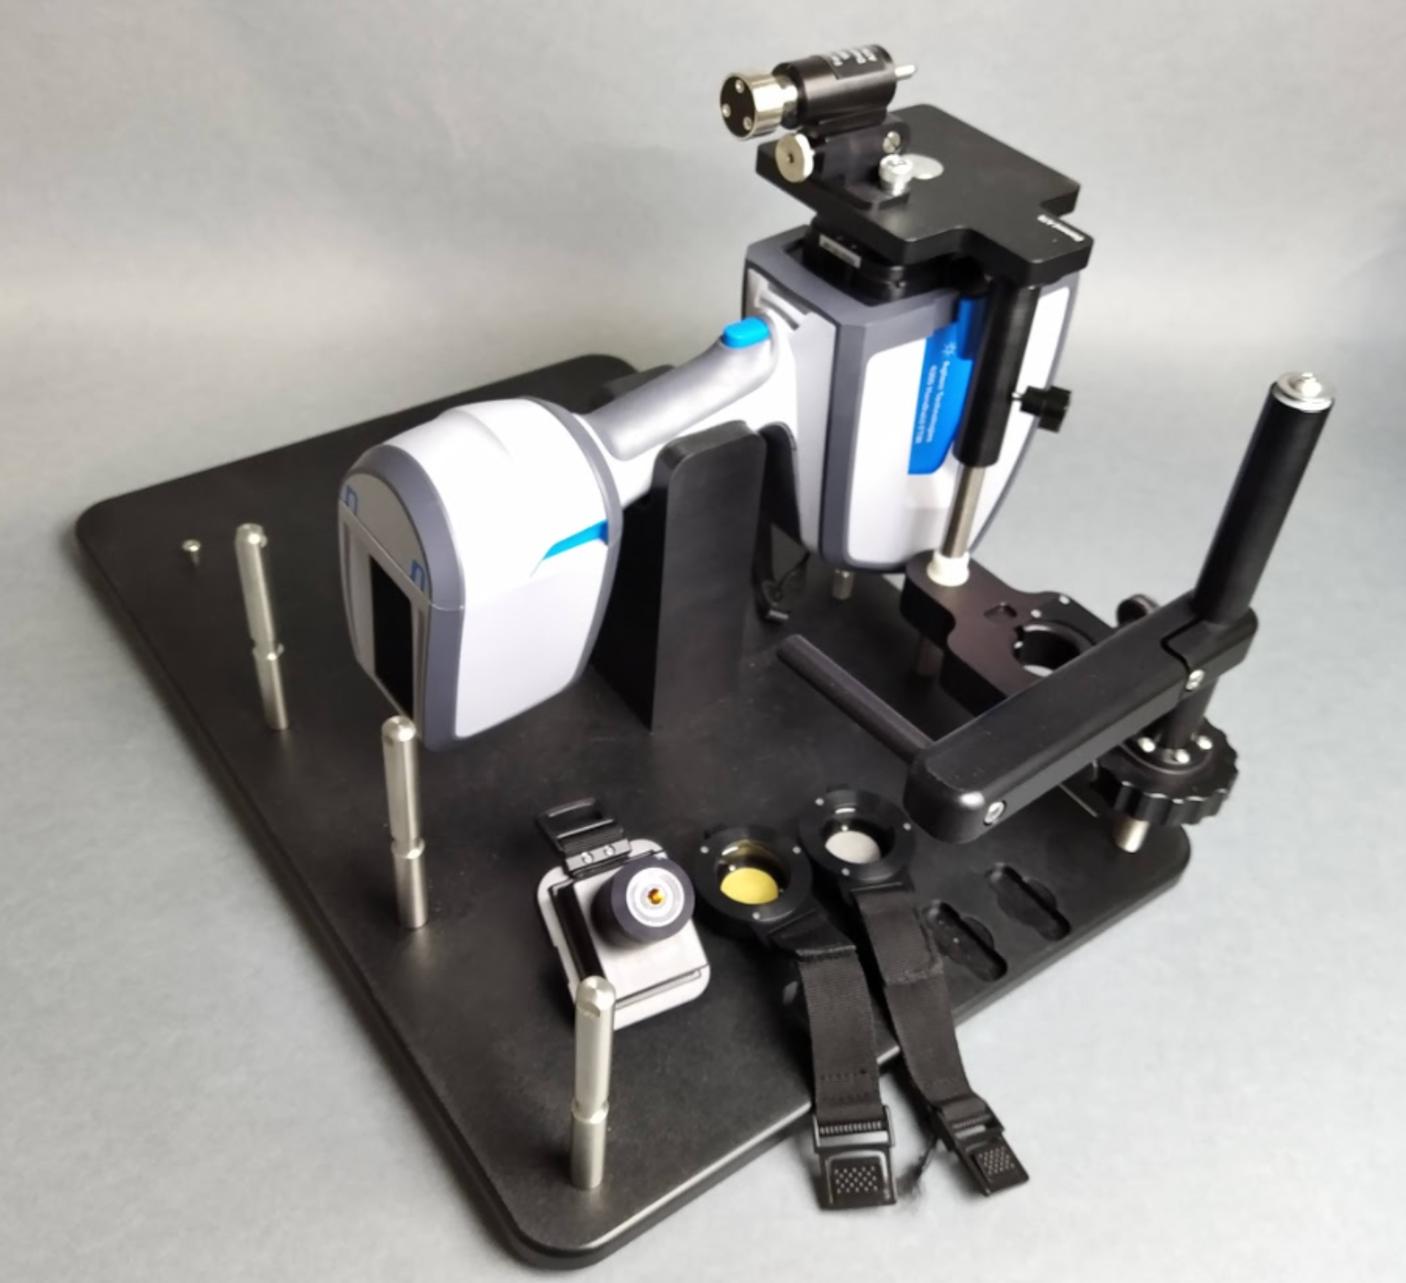 FTIR Spectrometer (handheld)